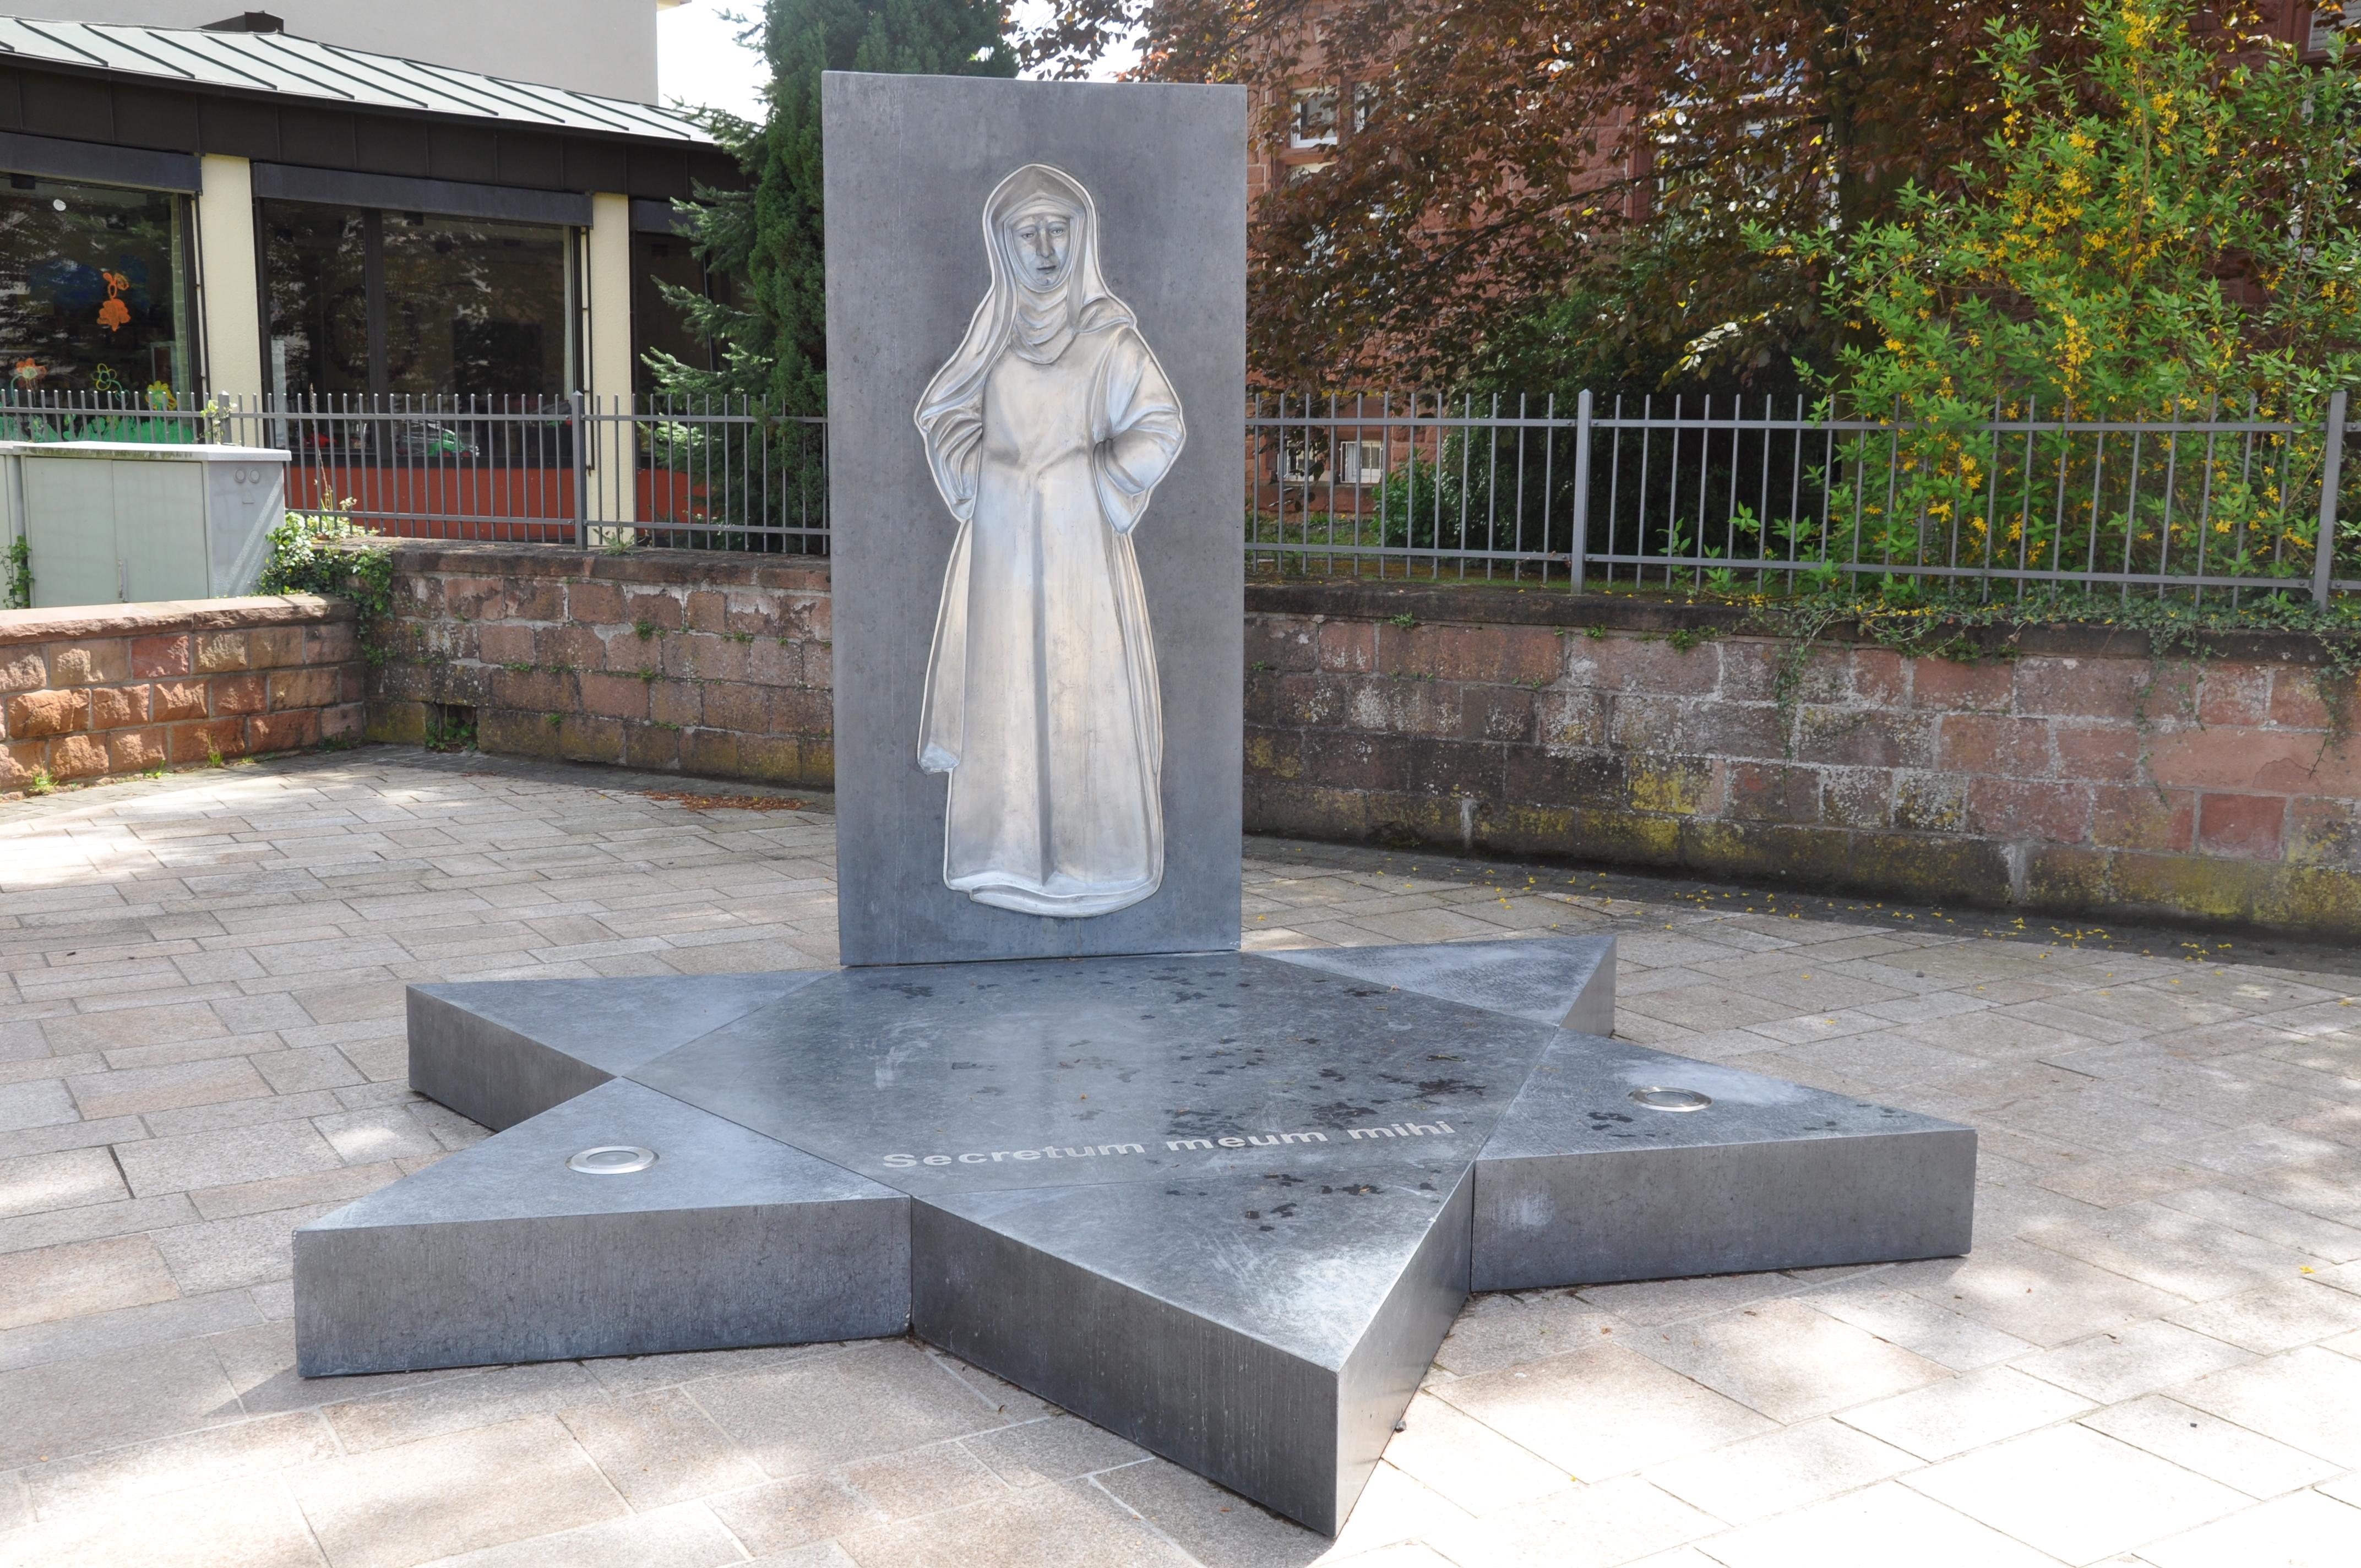 File:Bad Bergzabern Edith Stein Denkmal Vor St Martin